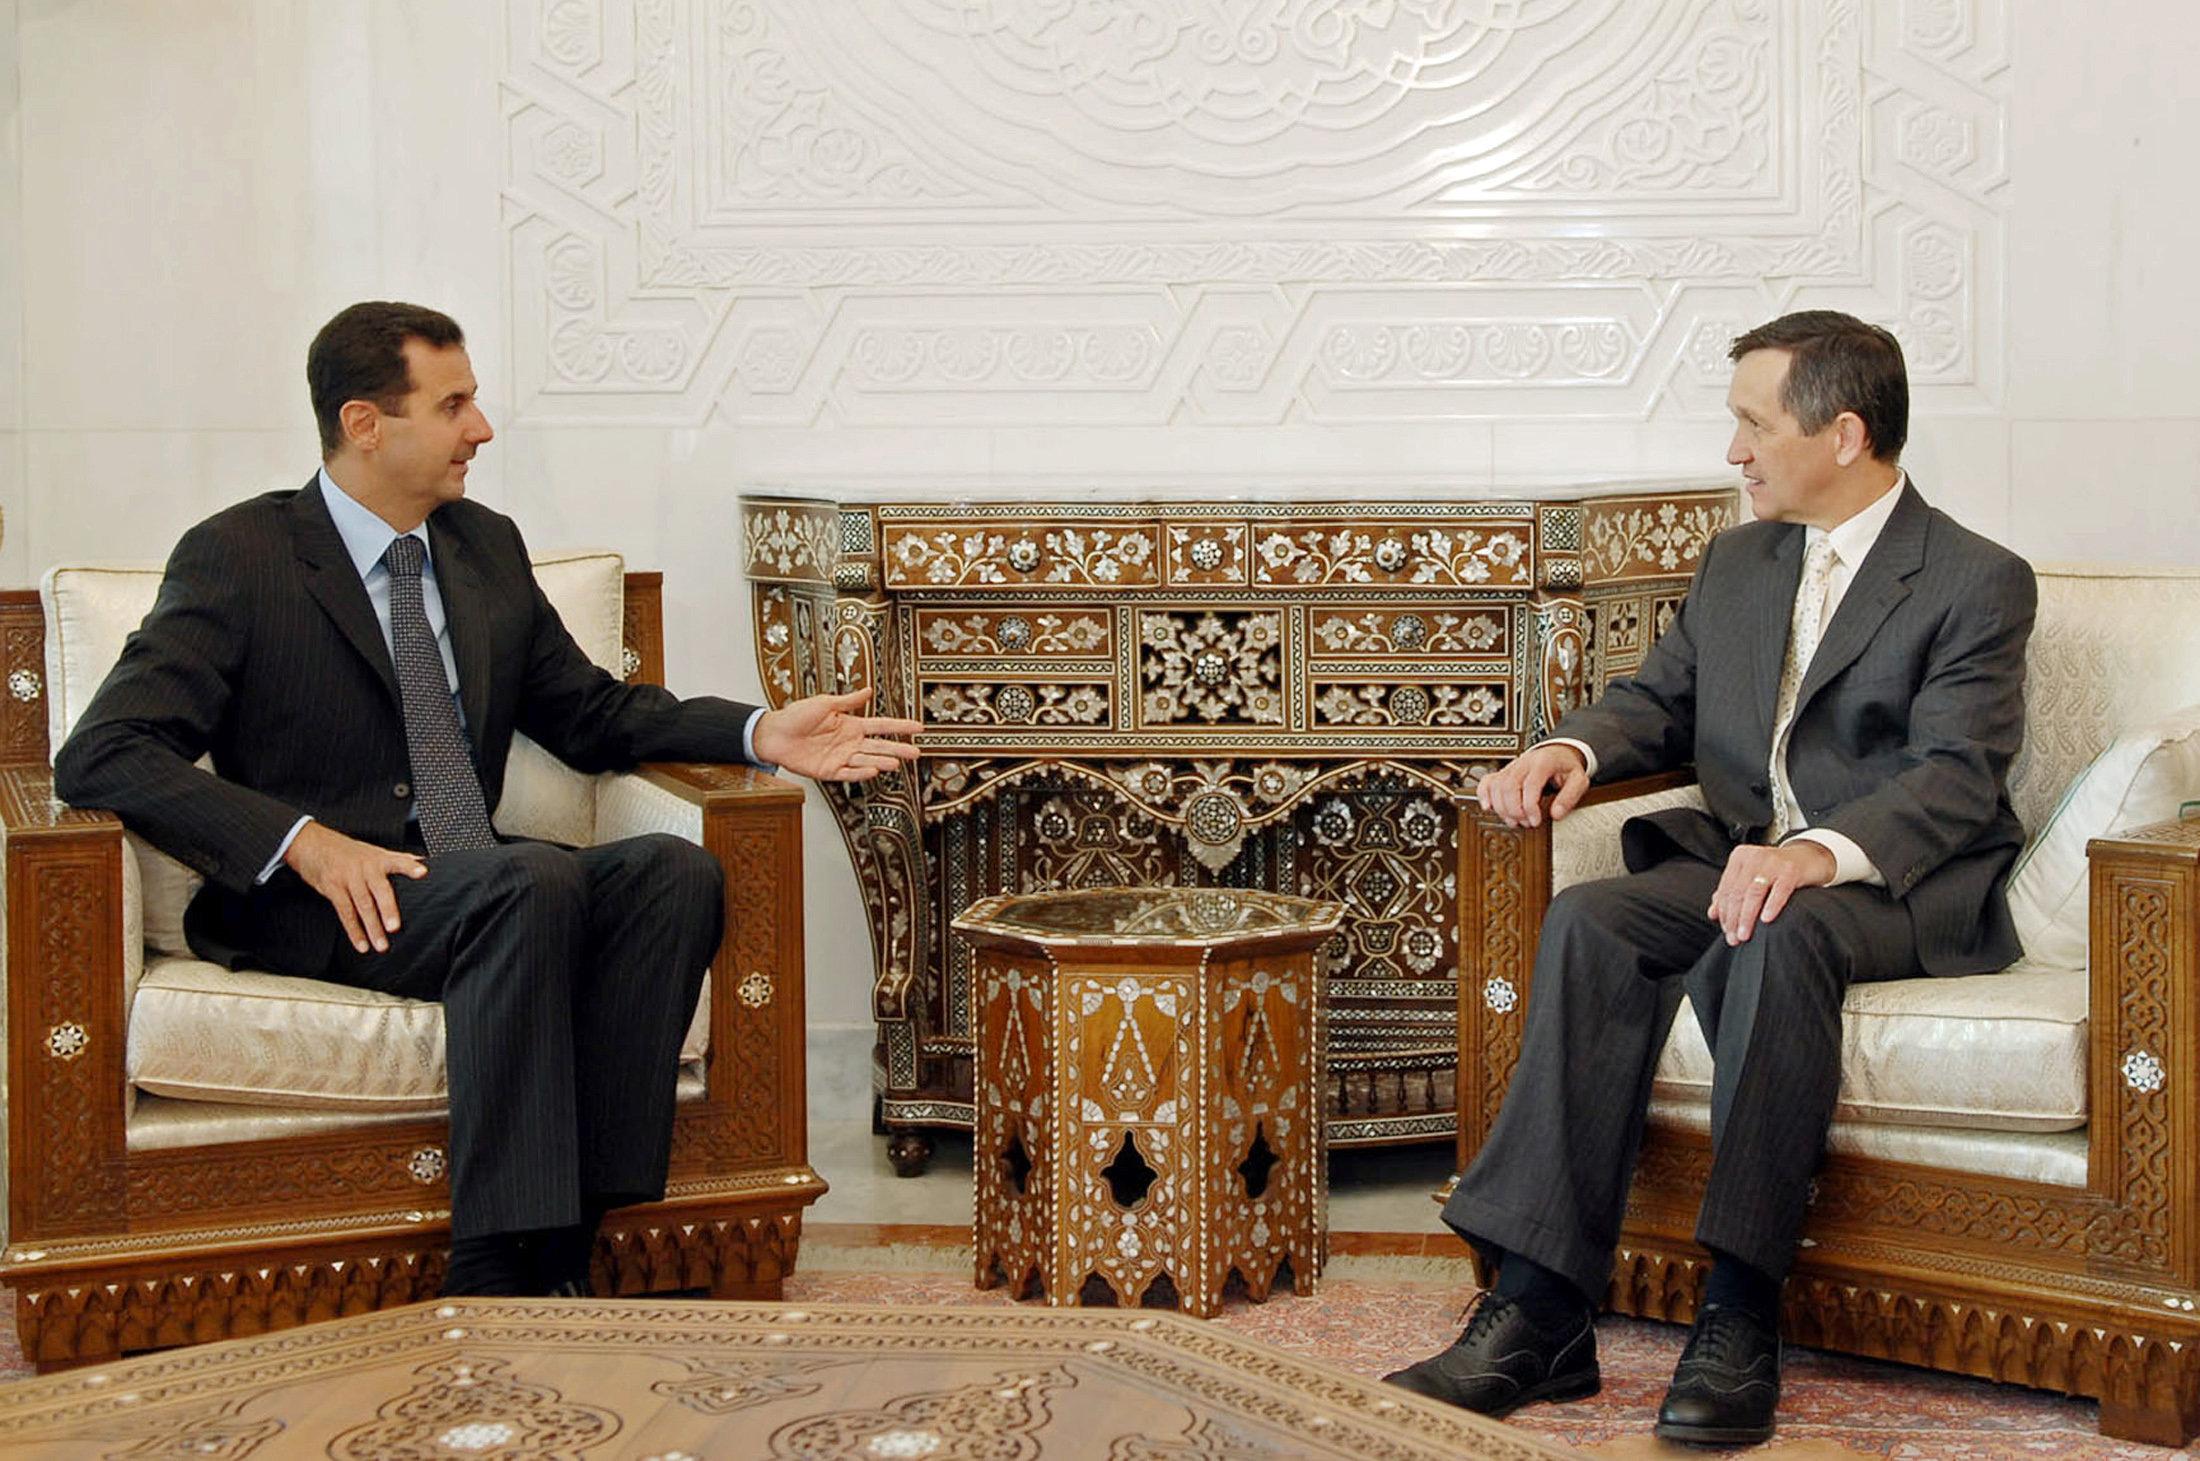 Syrian President Bashar al-Assad (L) meets U.S. Senator Dennis Kucinich (D-OH) in Damascus September 2, 2007. REUTERS/Sana   (SYRIA)